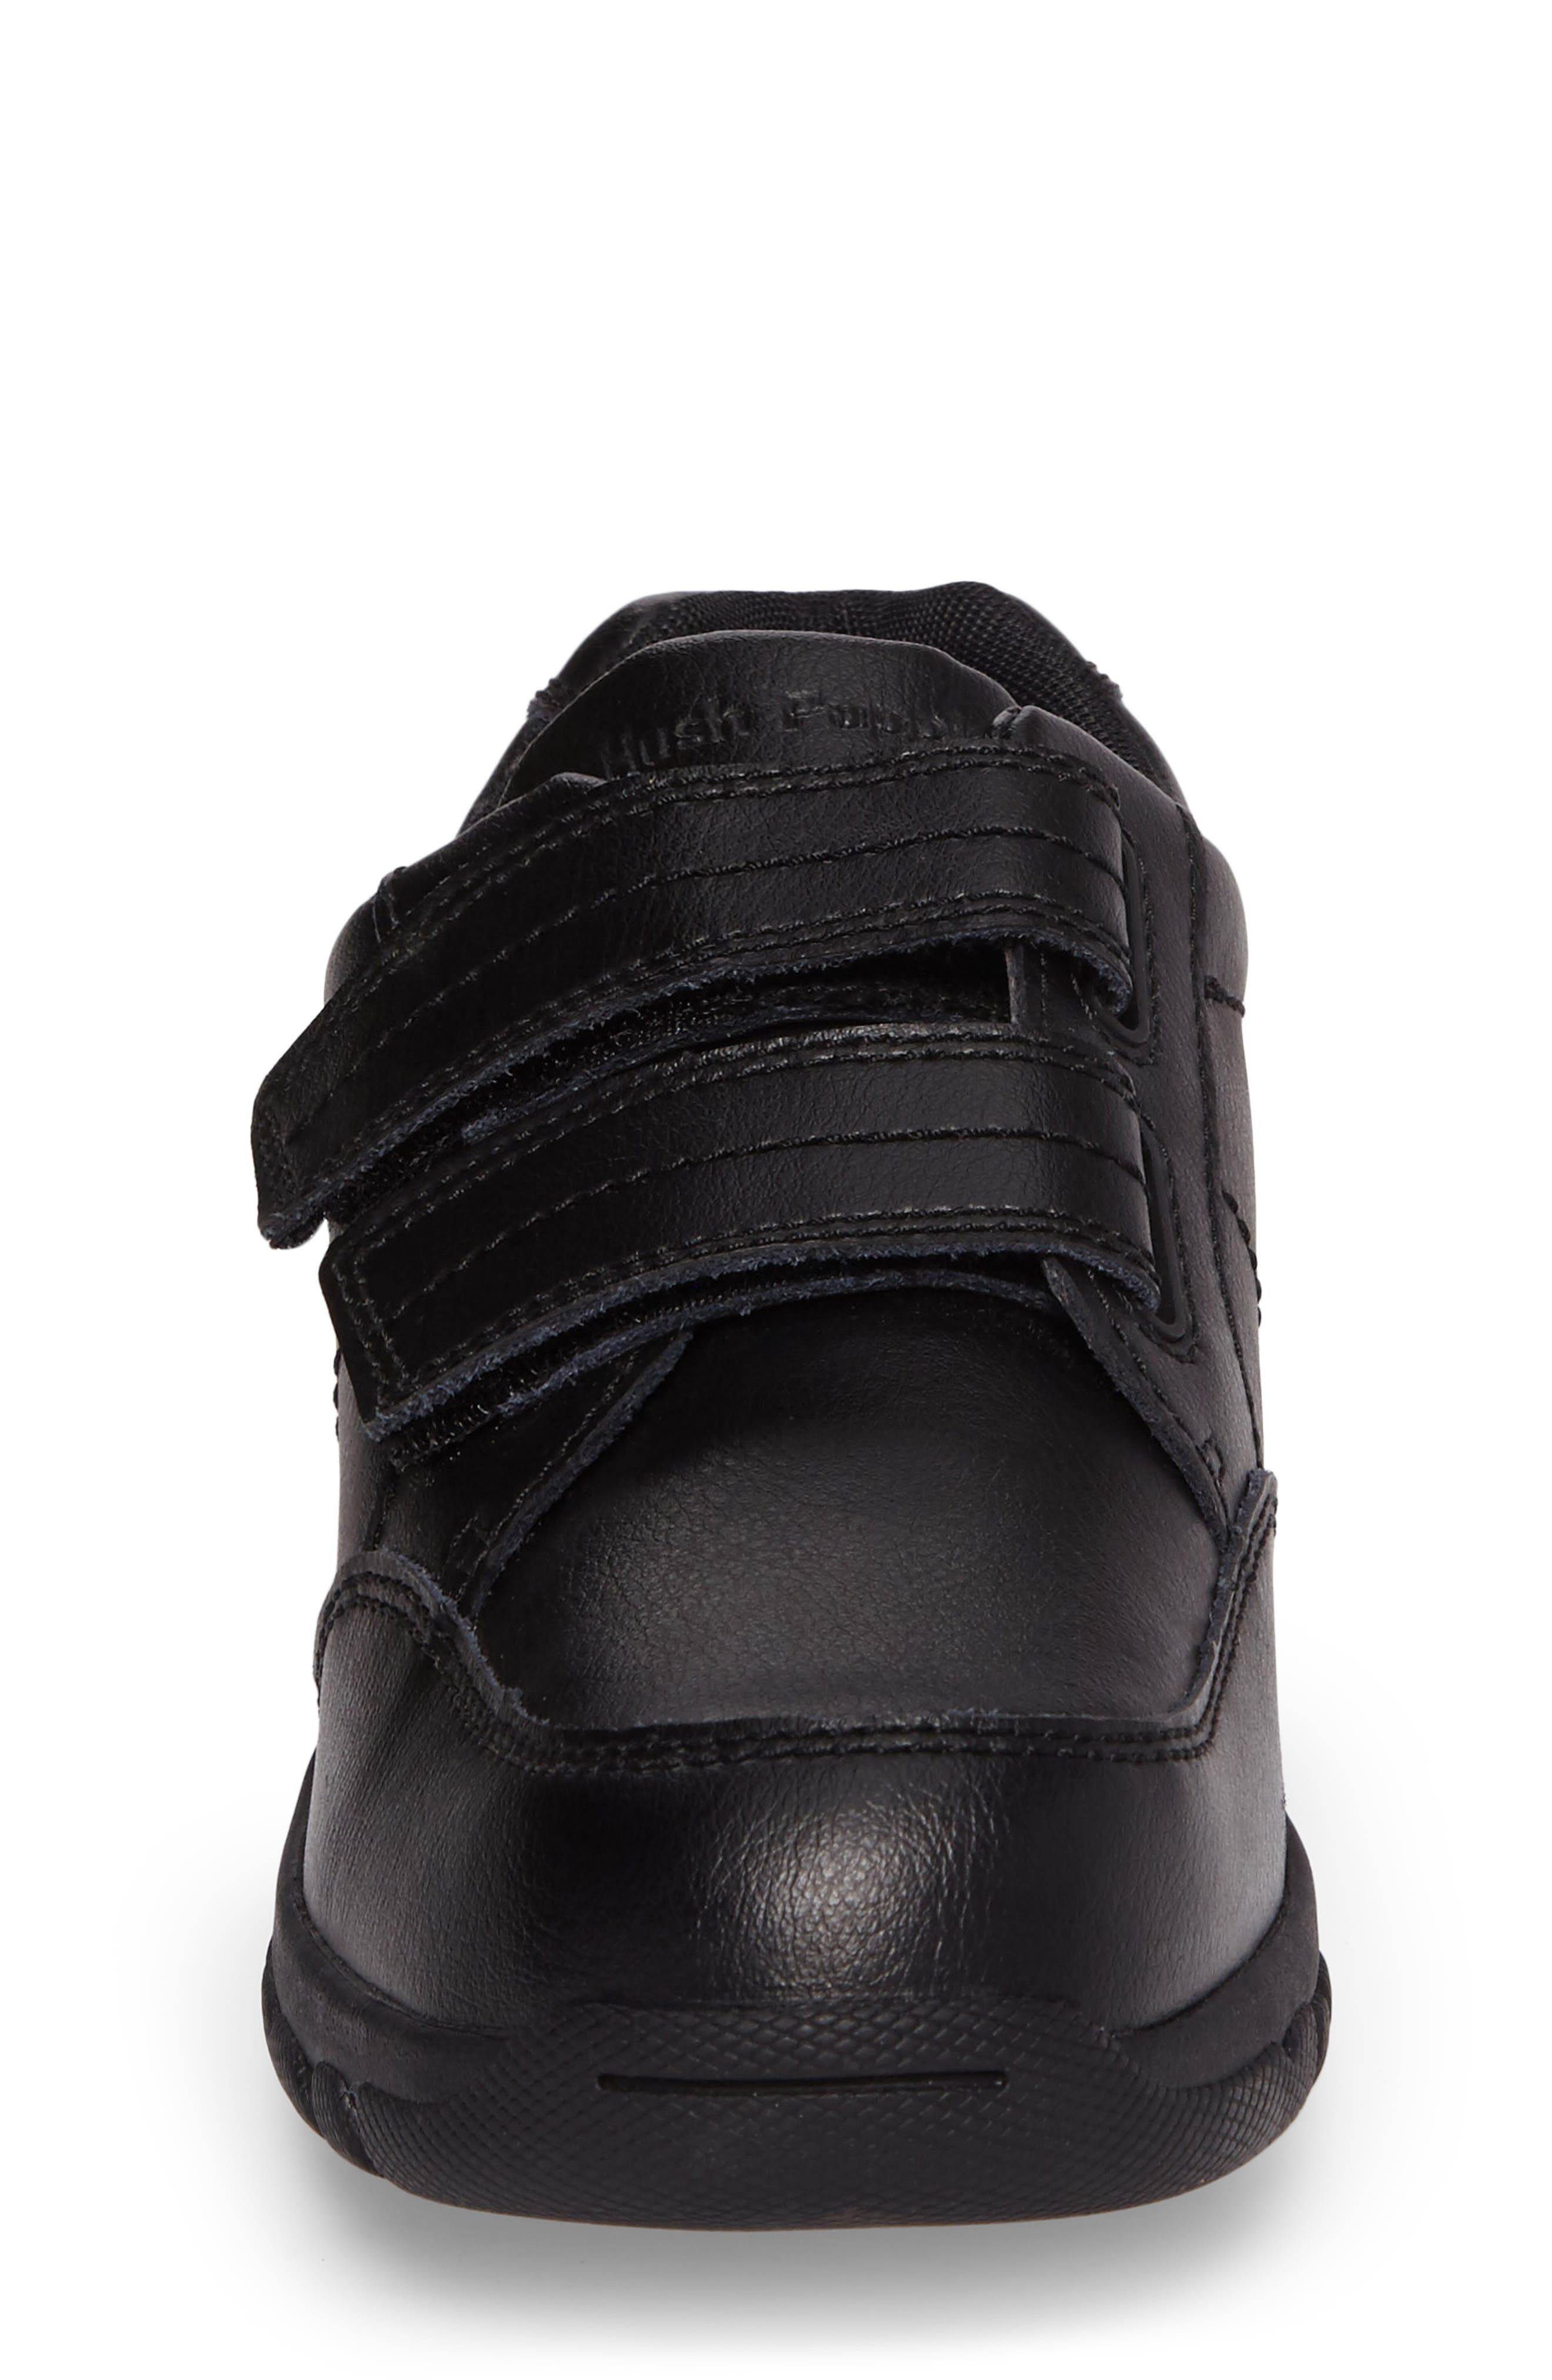 Jace Dress Sneaker,                             Alternate thumbnail 4, color,                             Black Leather